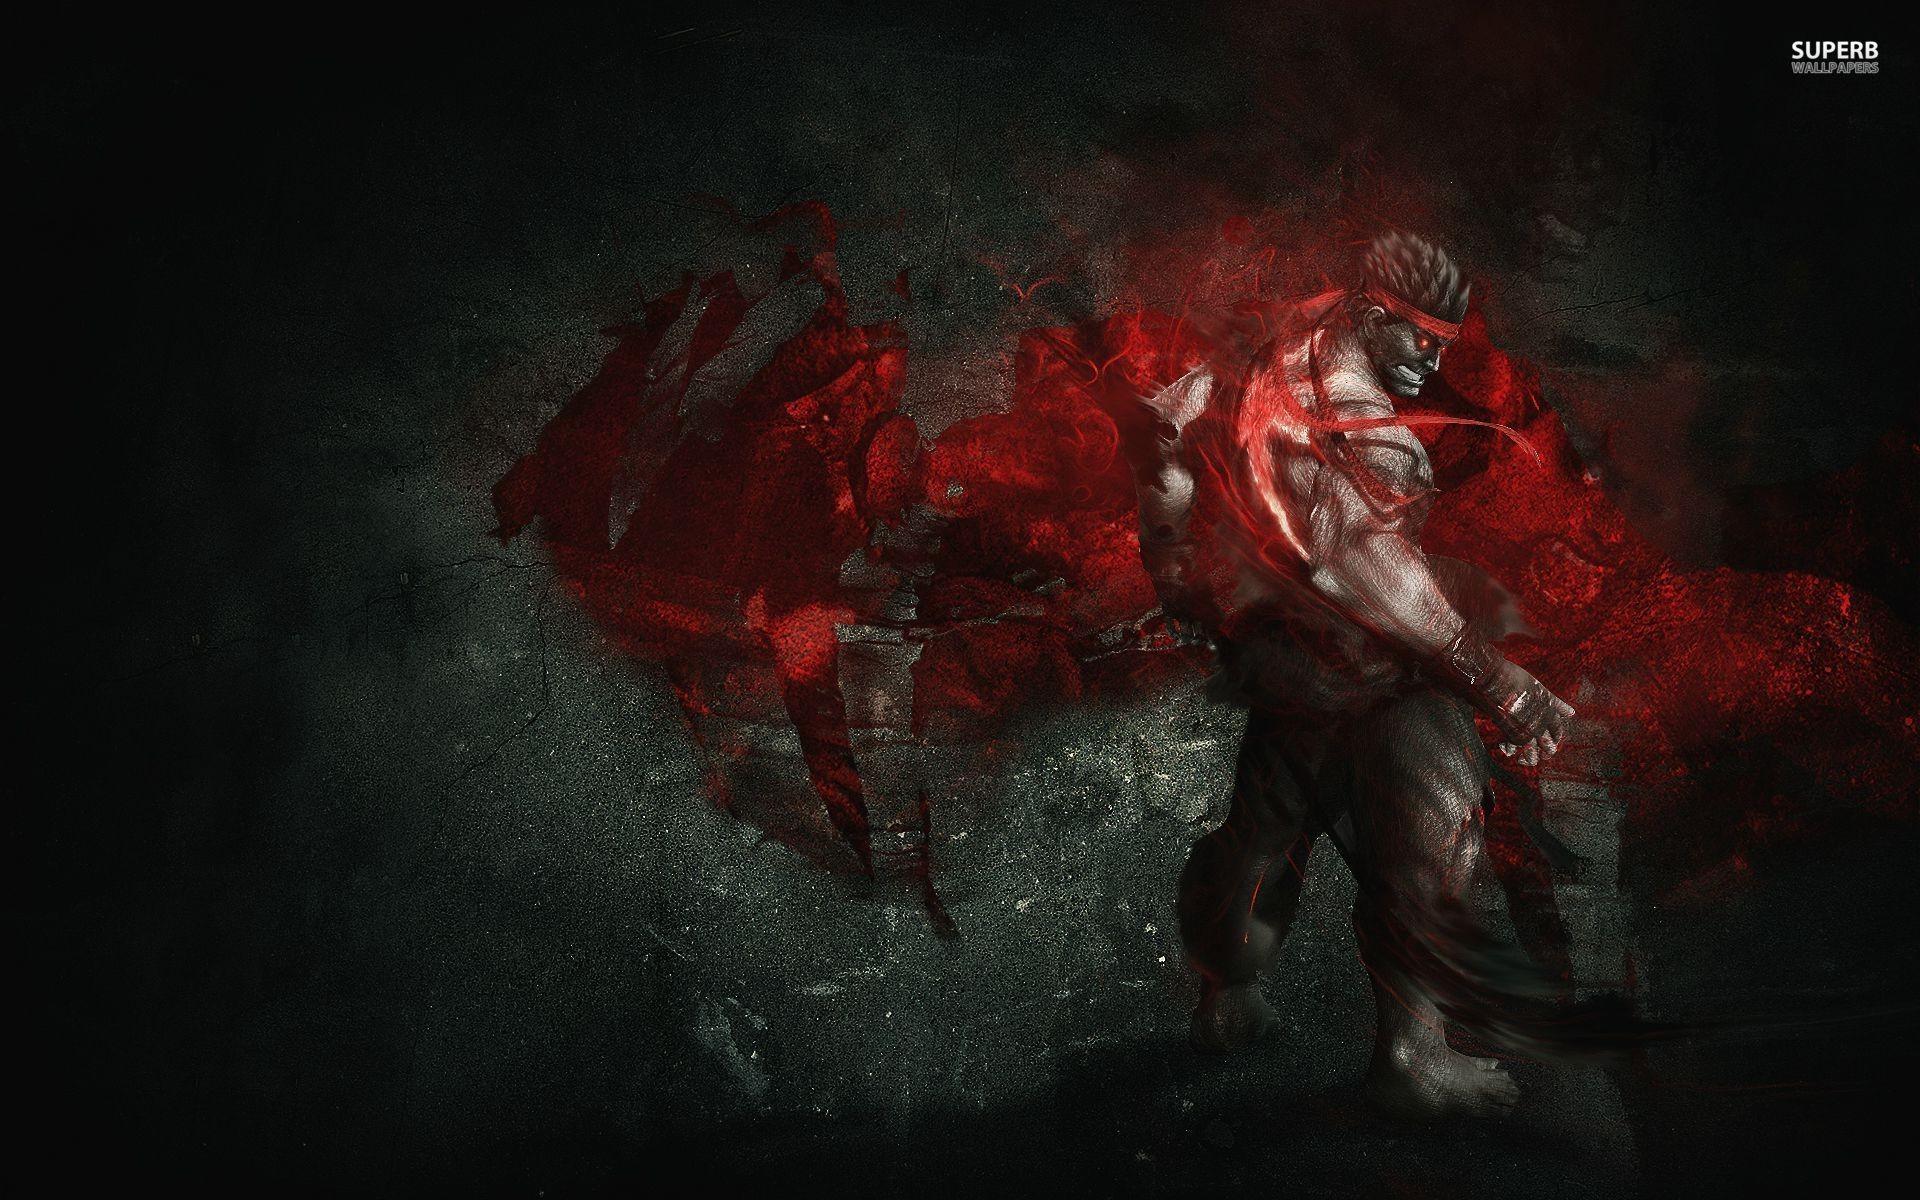 Ultra Street Fighter 4 Ryu Hd Wallpapers – ImgMob